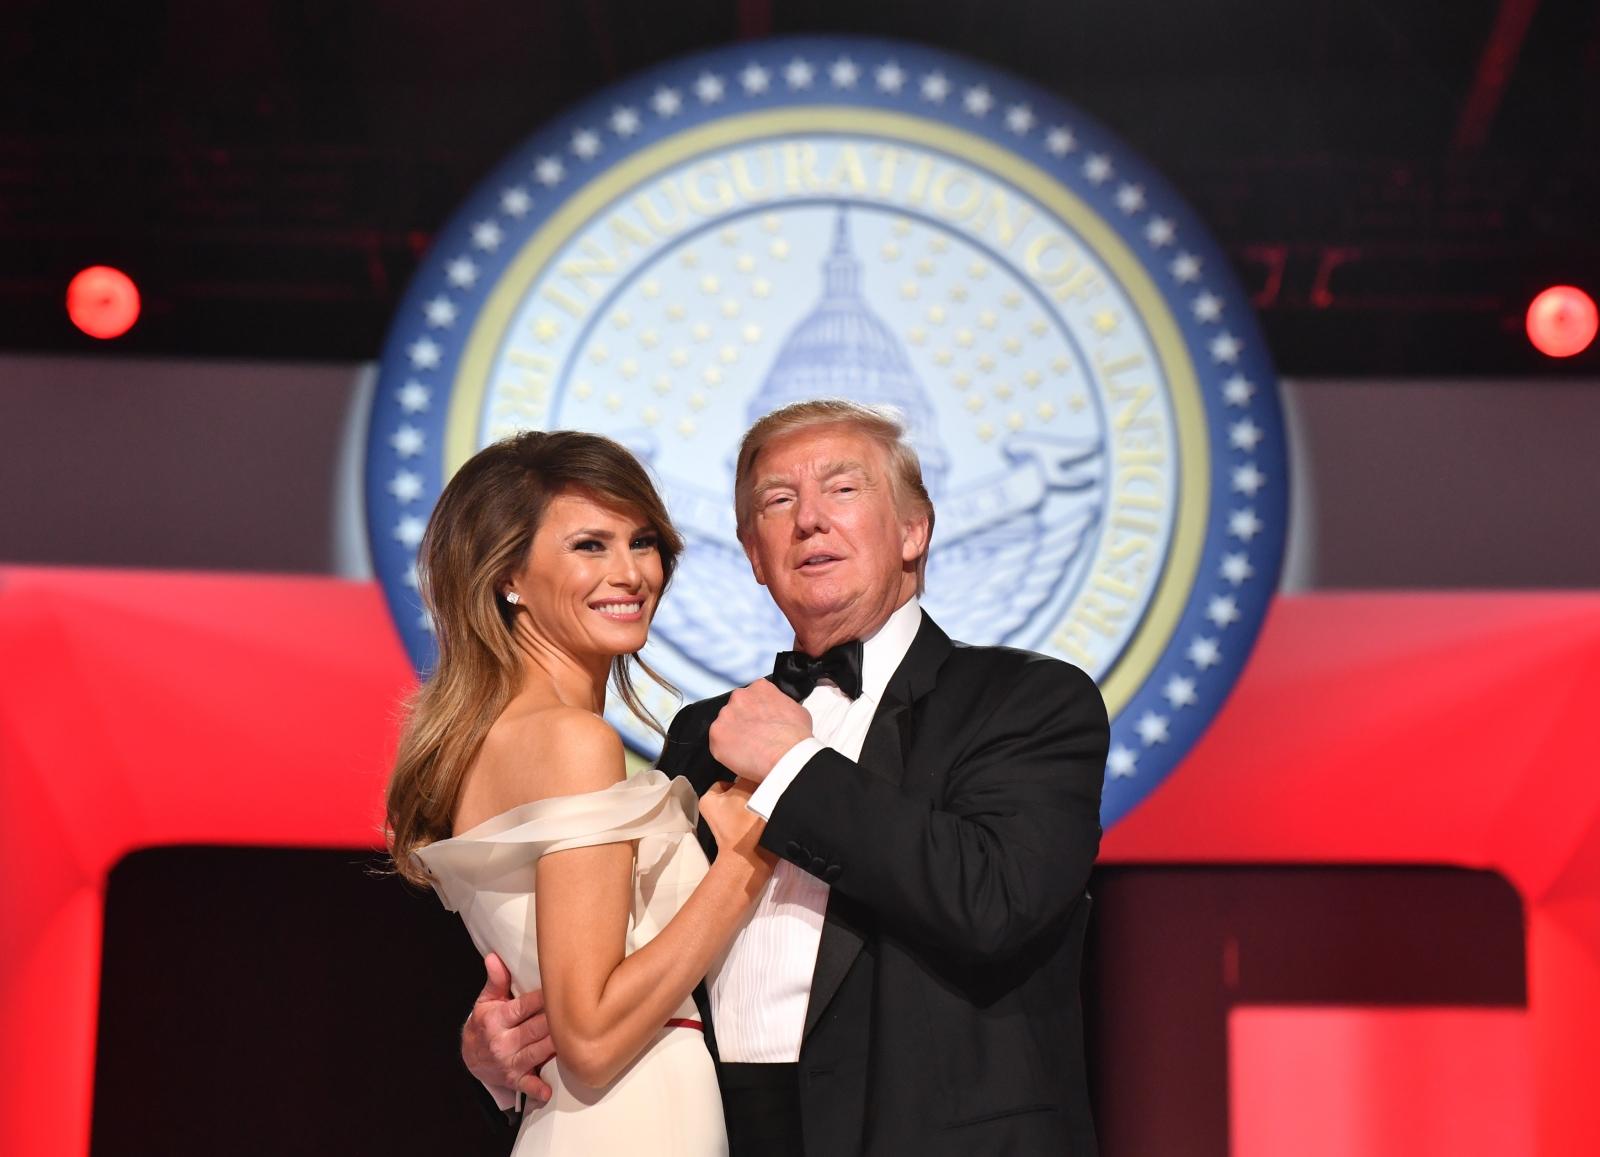 Melania Trump and Donald Trump 2017